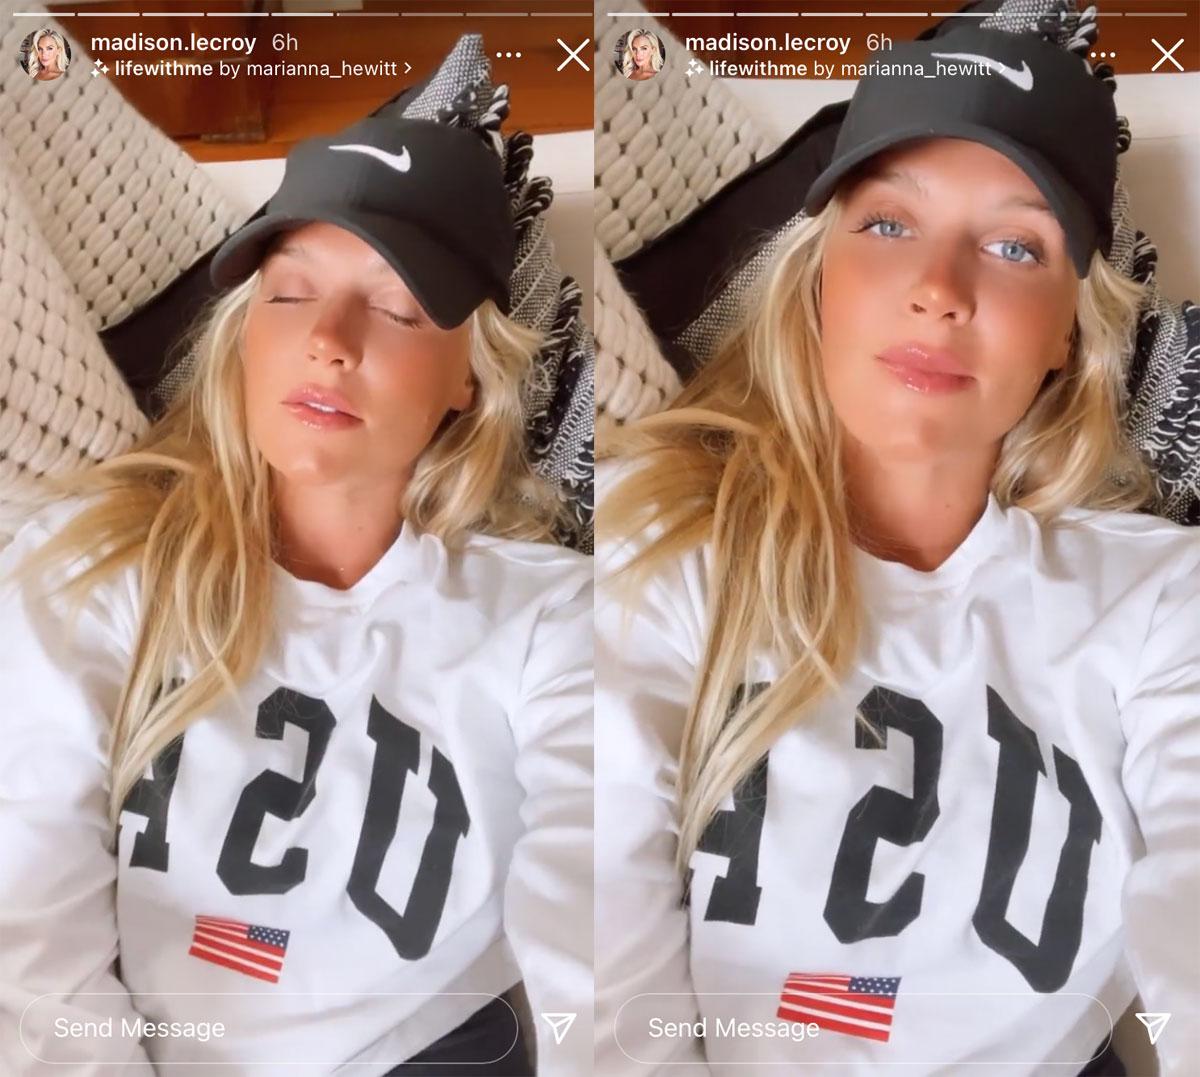 Madison LeCroy had a few nip slips on Instagram Live on Sunday night! Oops!